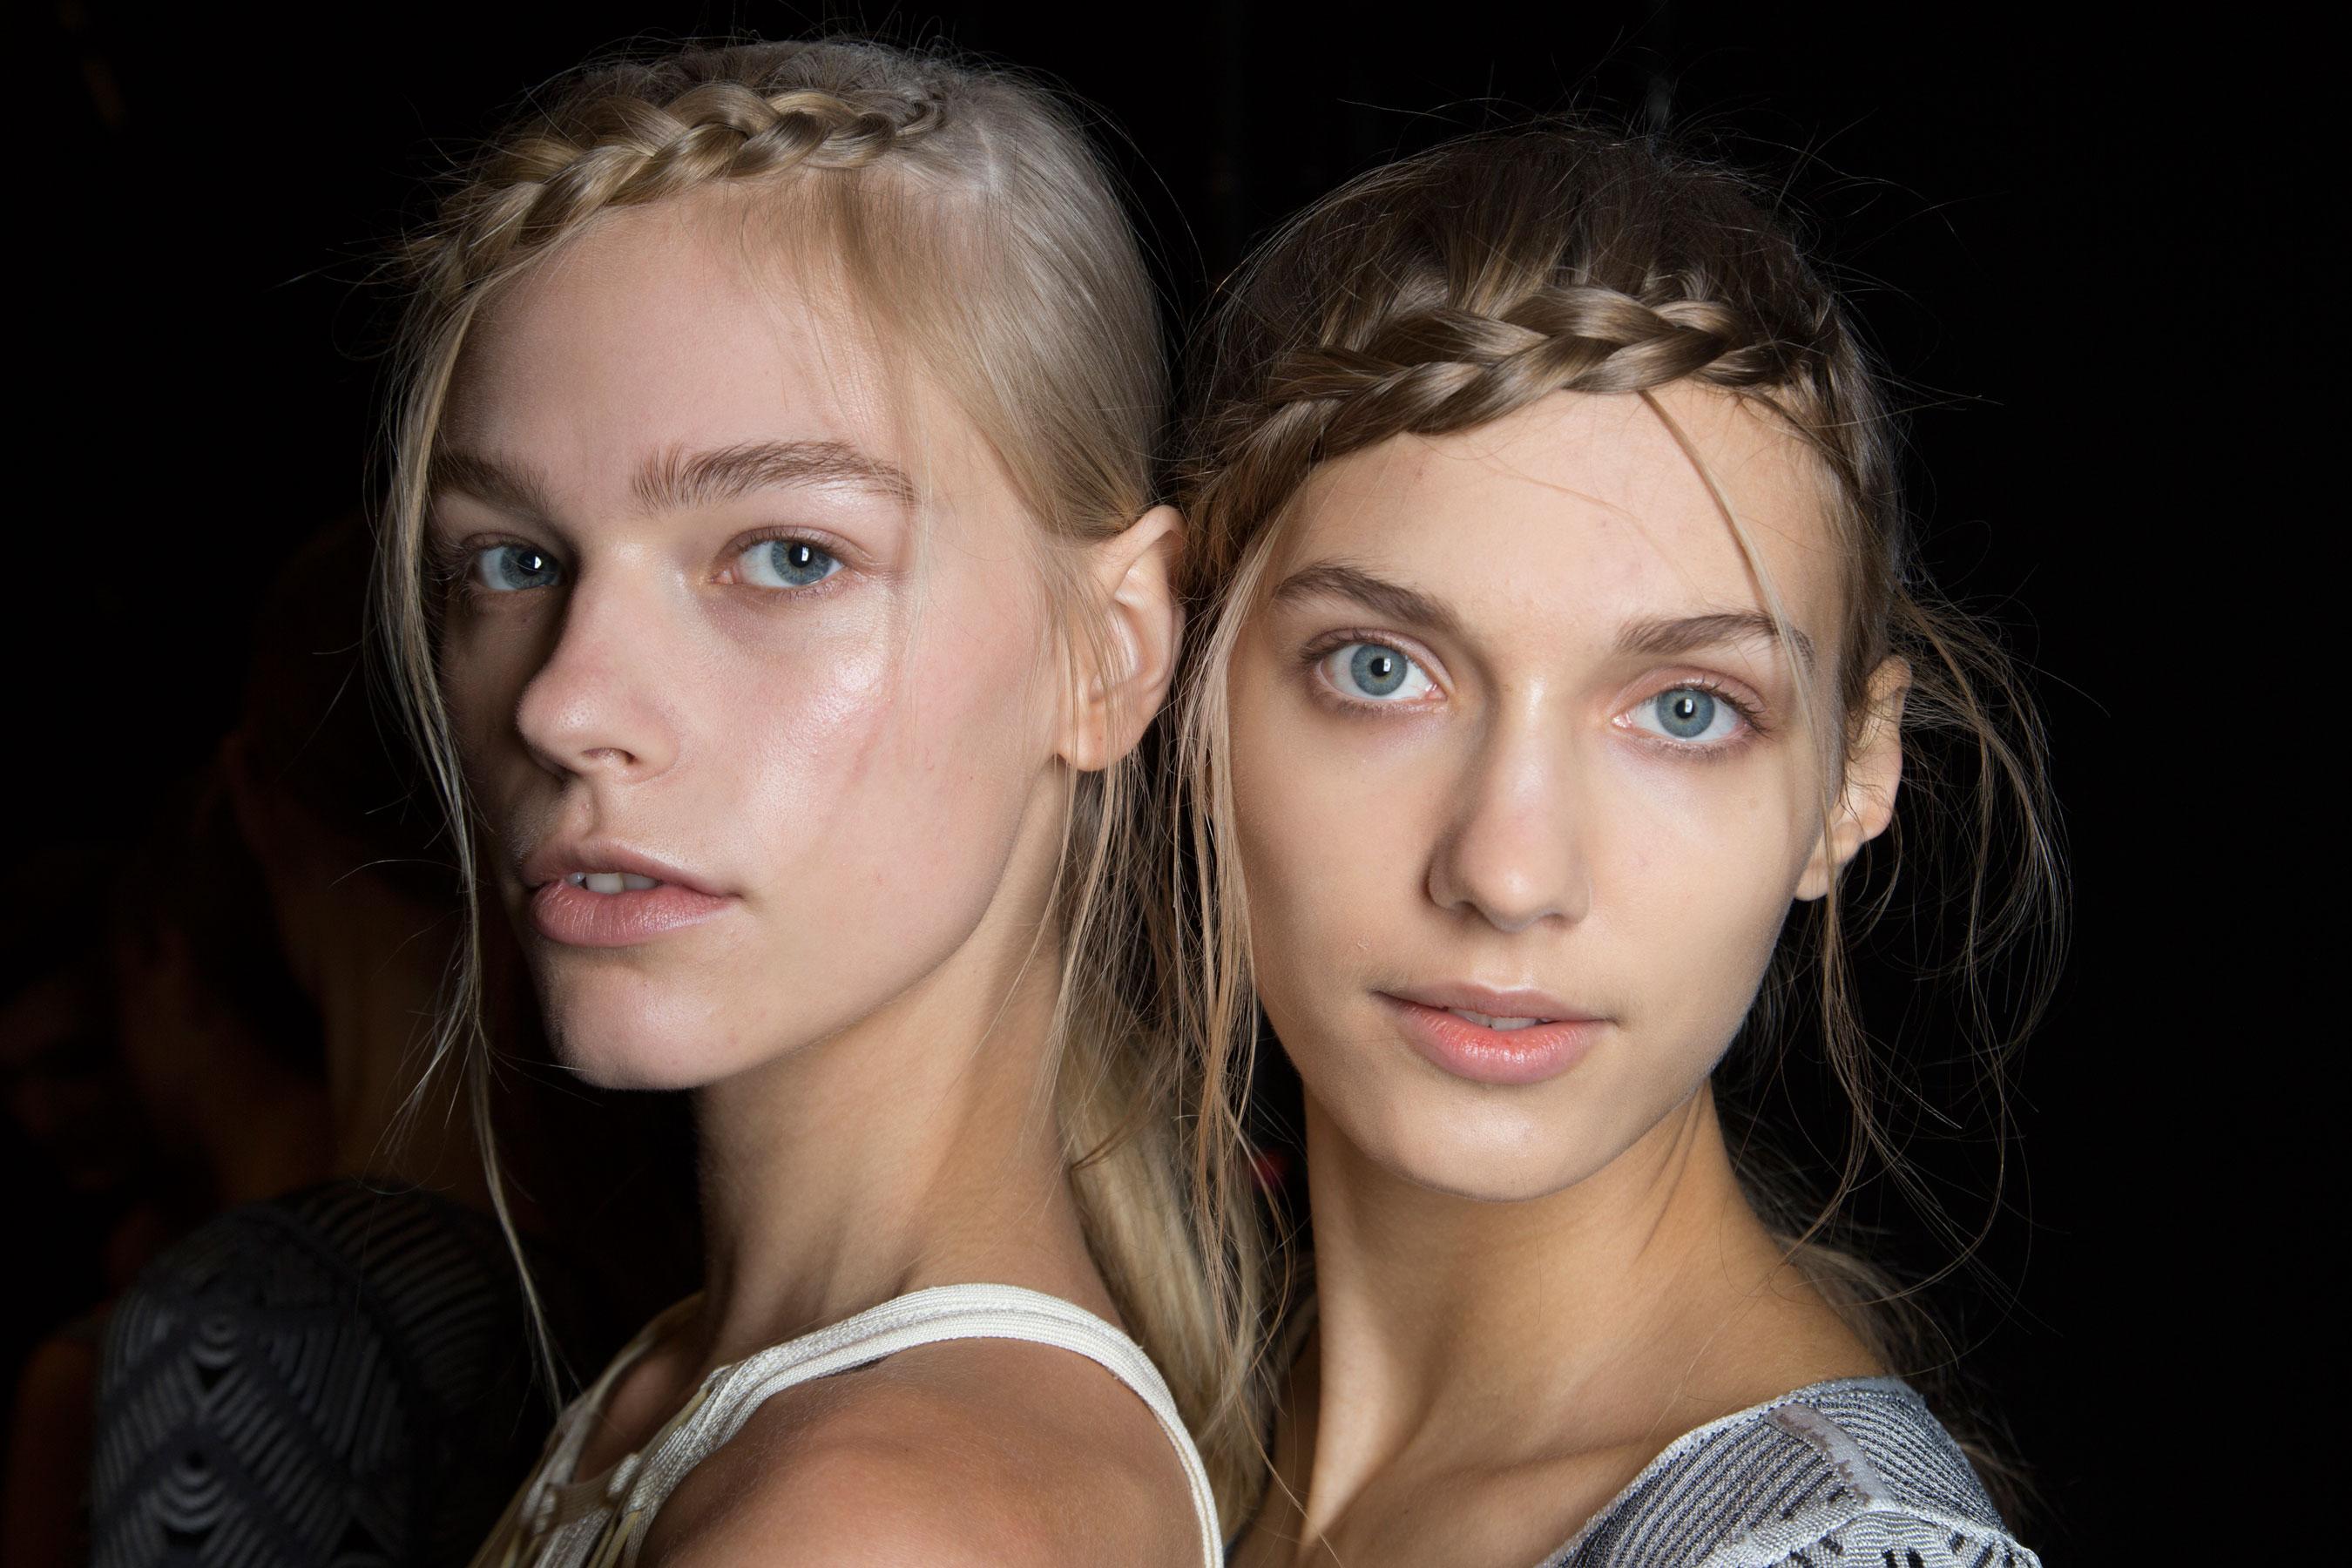 Herve-Leger-backstage-beauty-spring-2016-fashion-show-the-impression-79